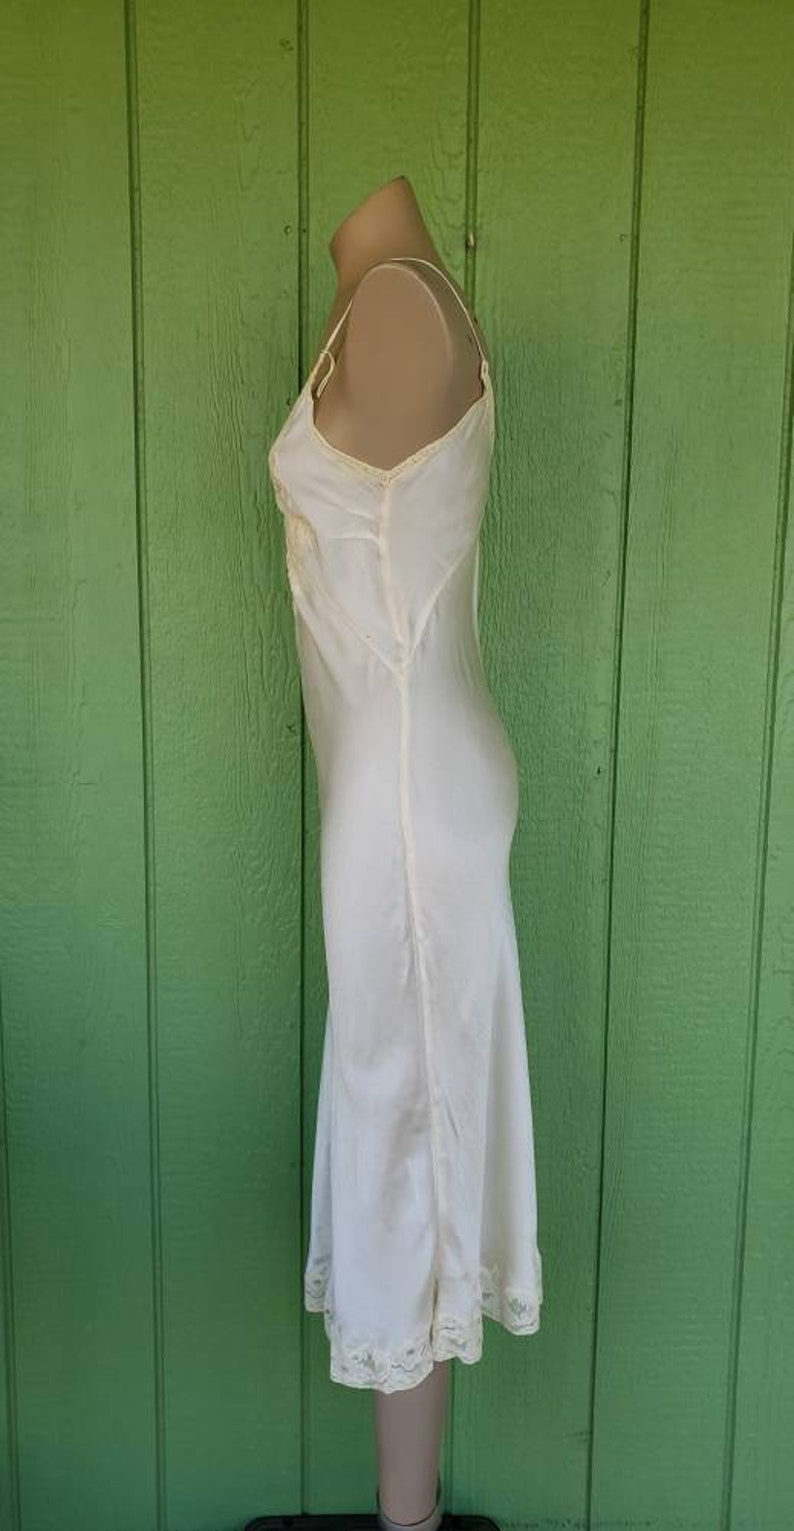 Small 32 Bust Vintage 1930/'s Bias Cut Silk Full Slip Cream Silk 1930/'s Slip Lace Accents